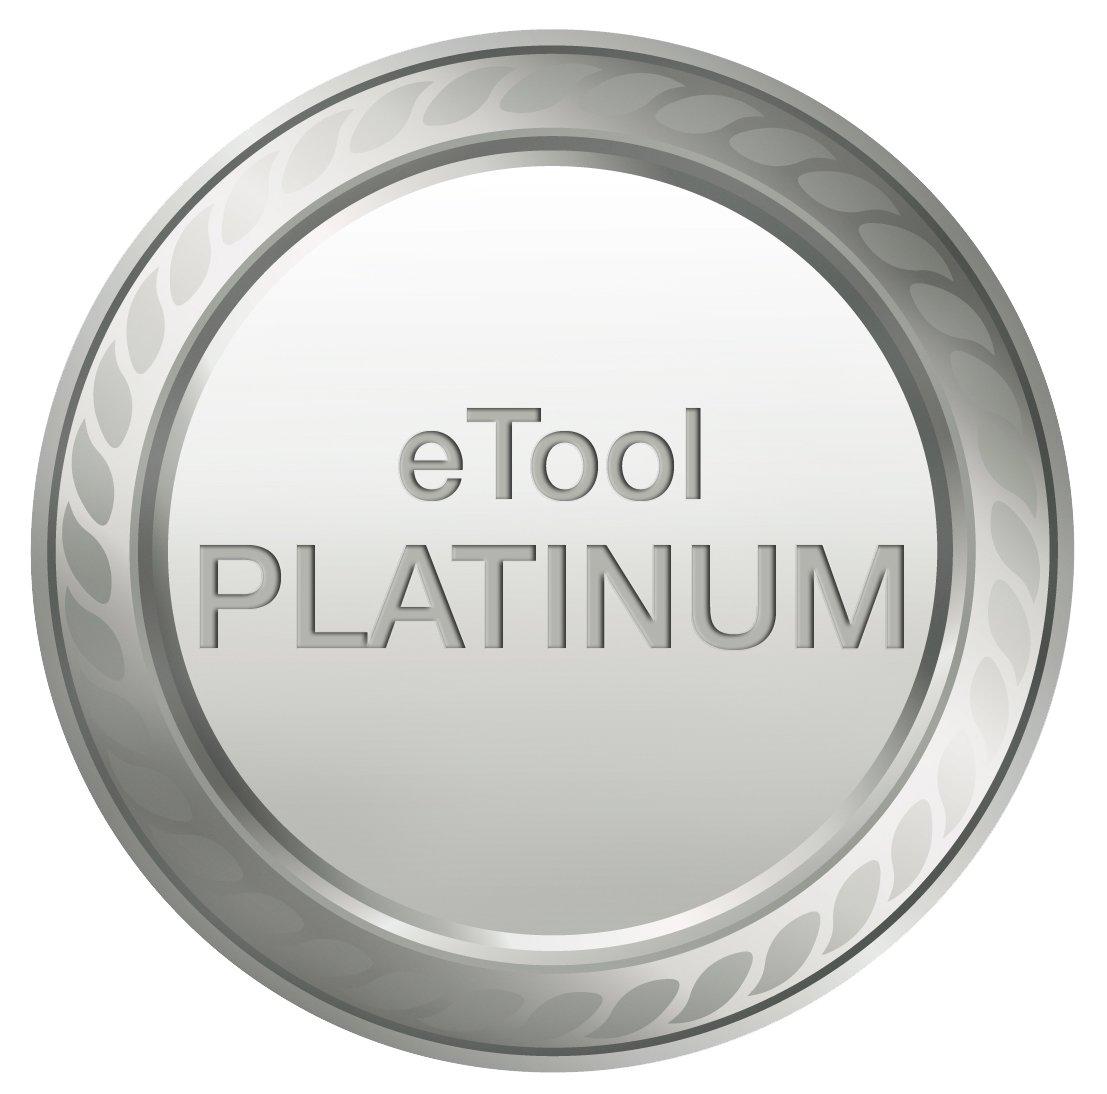 etool_plat_medal